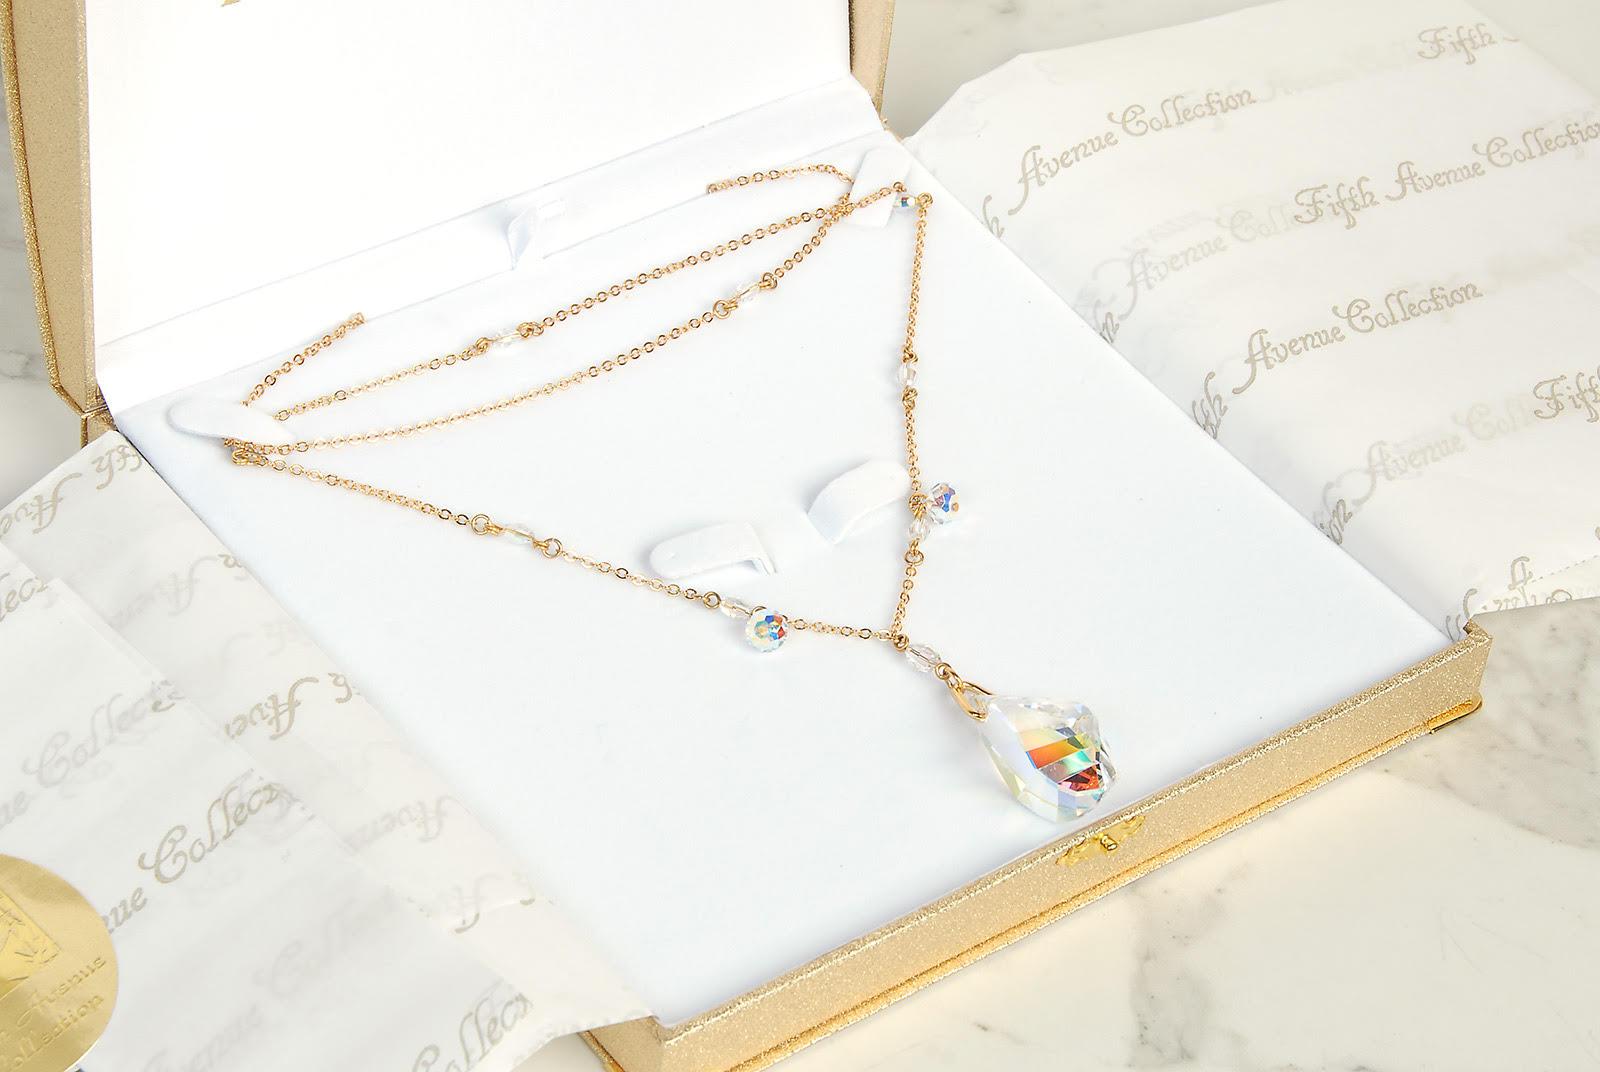 Exclusive Fifth Avenue Necklace